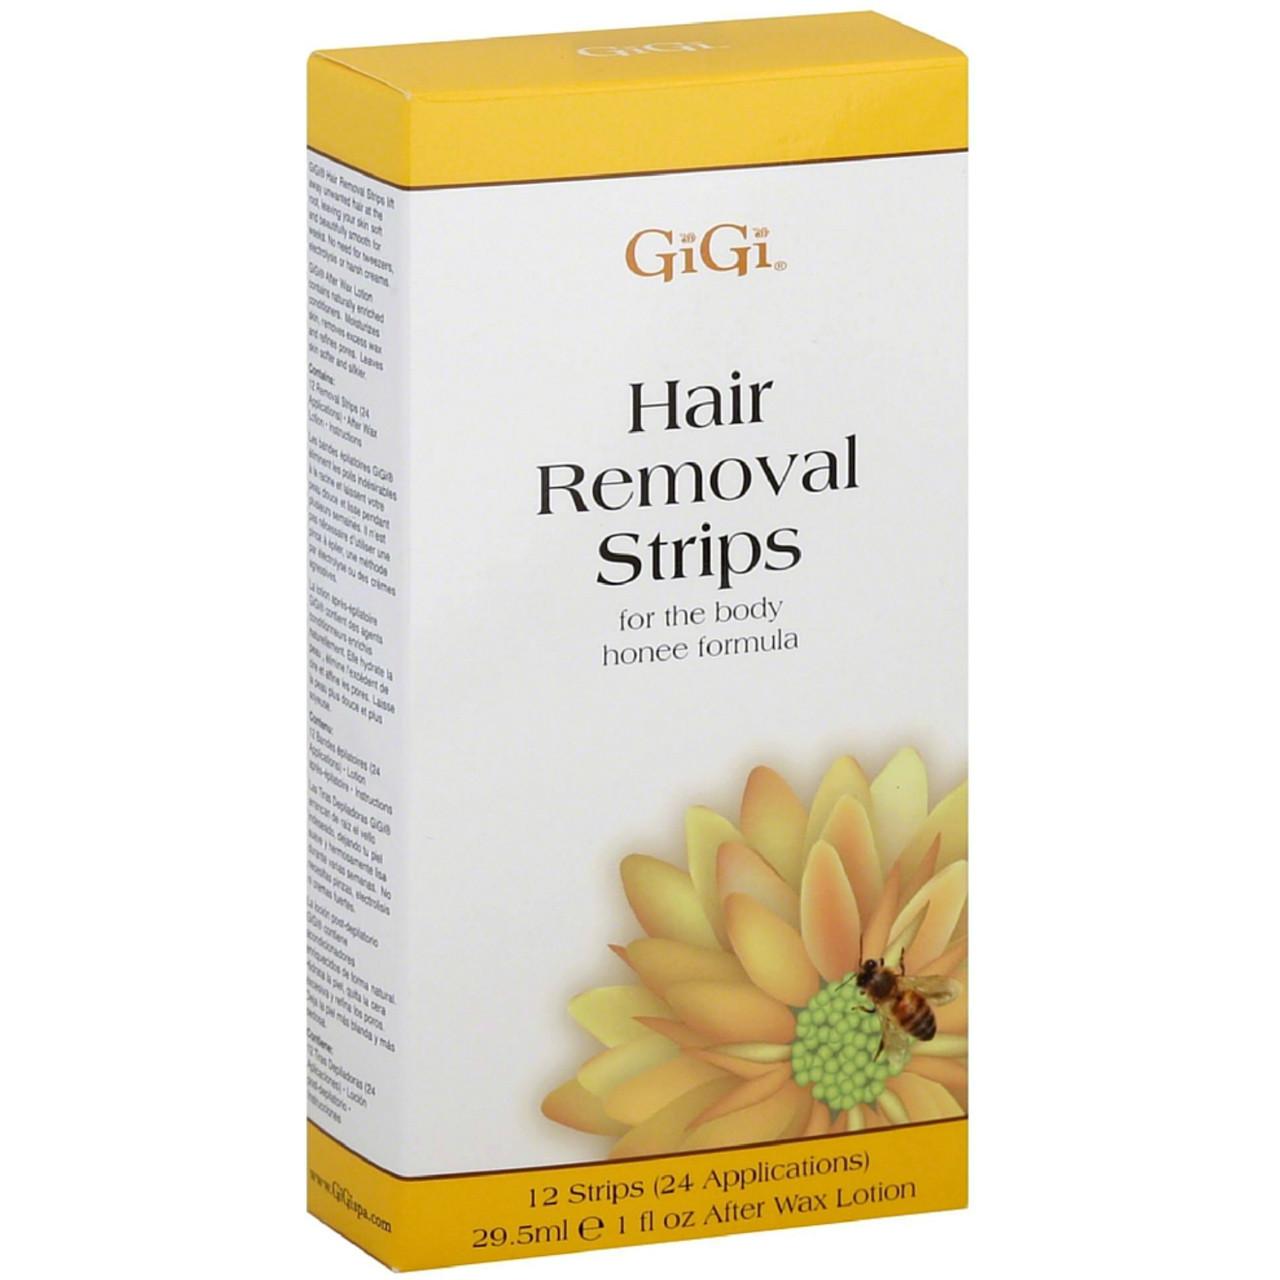 Gigi Hair Removal Strips for The Body